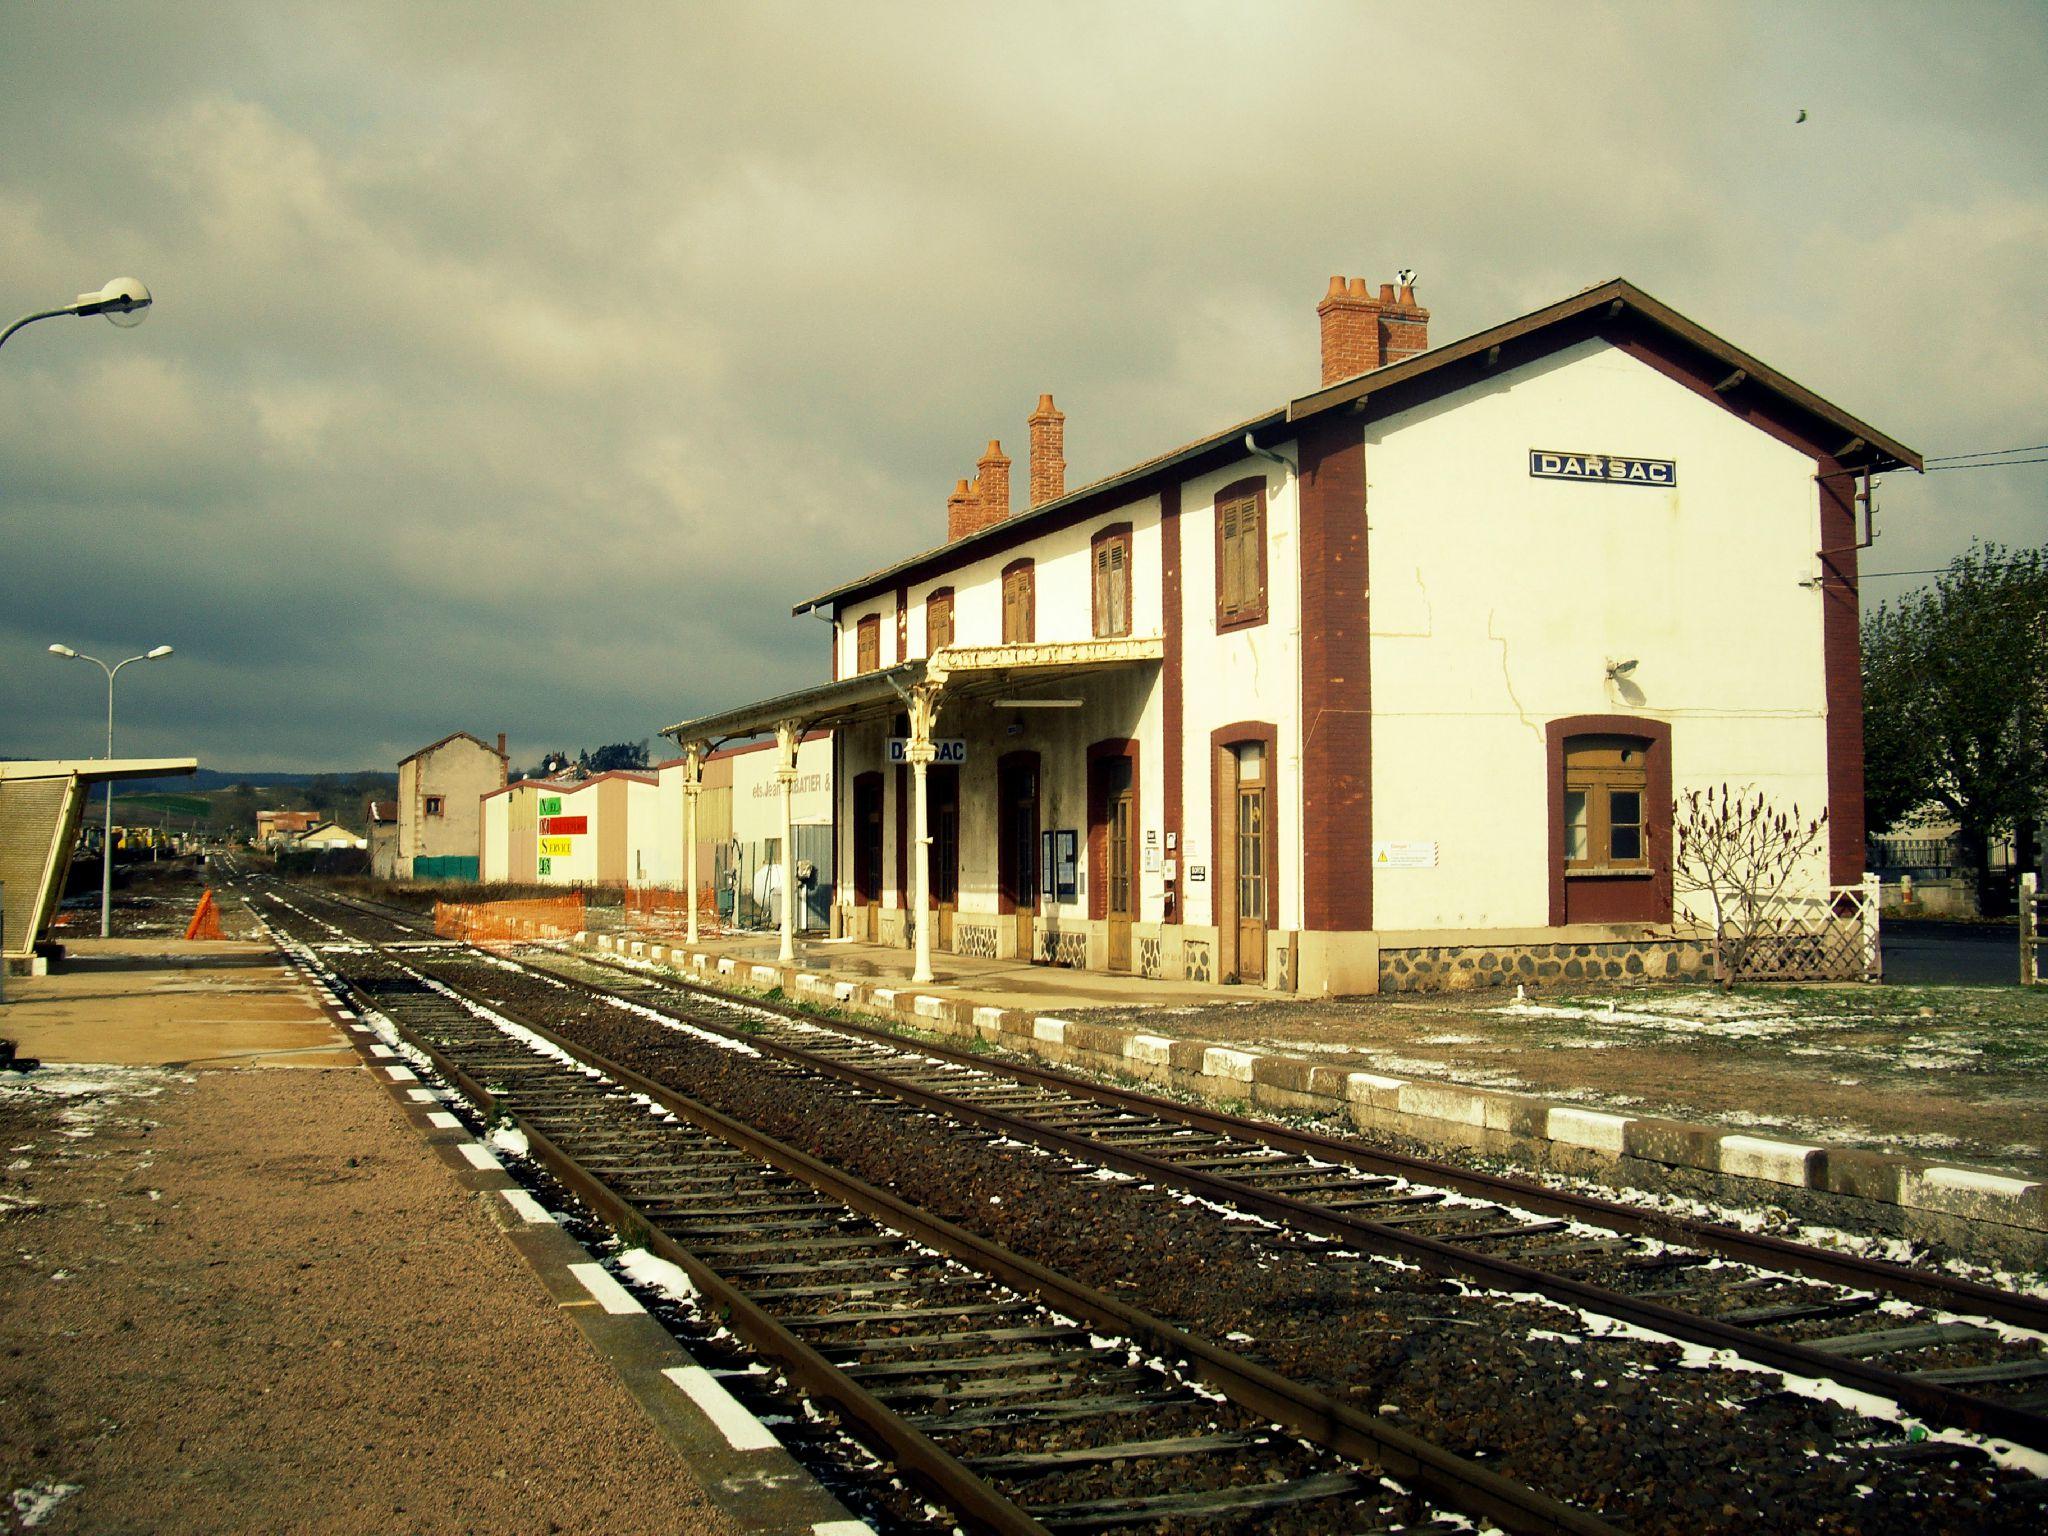 Darsac (Haute-Loire - 43)